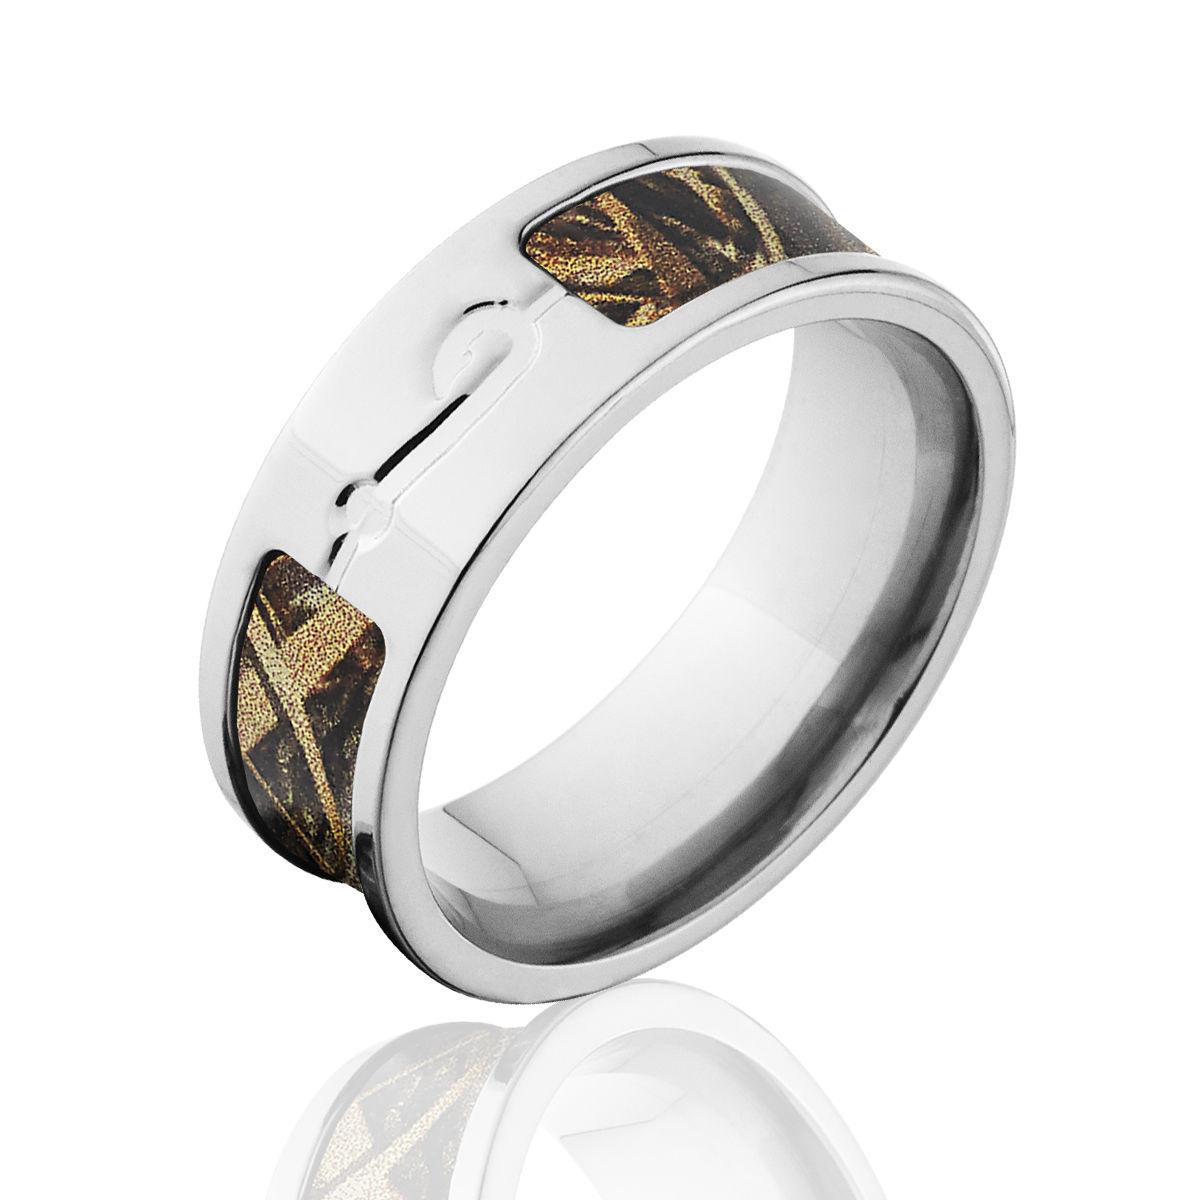 Max 5 Camo Wedding Rings Titanium RealTree Camo Fishhook Ring